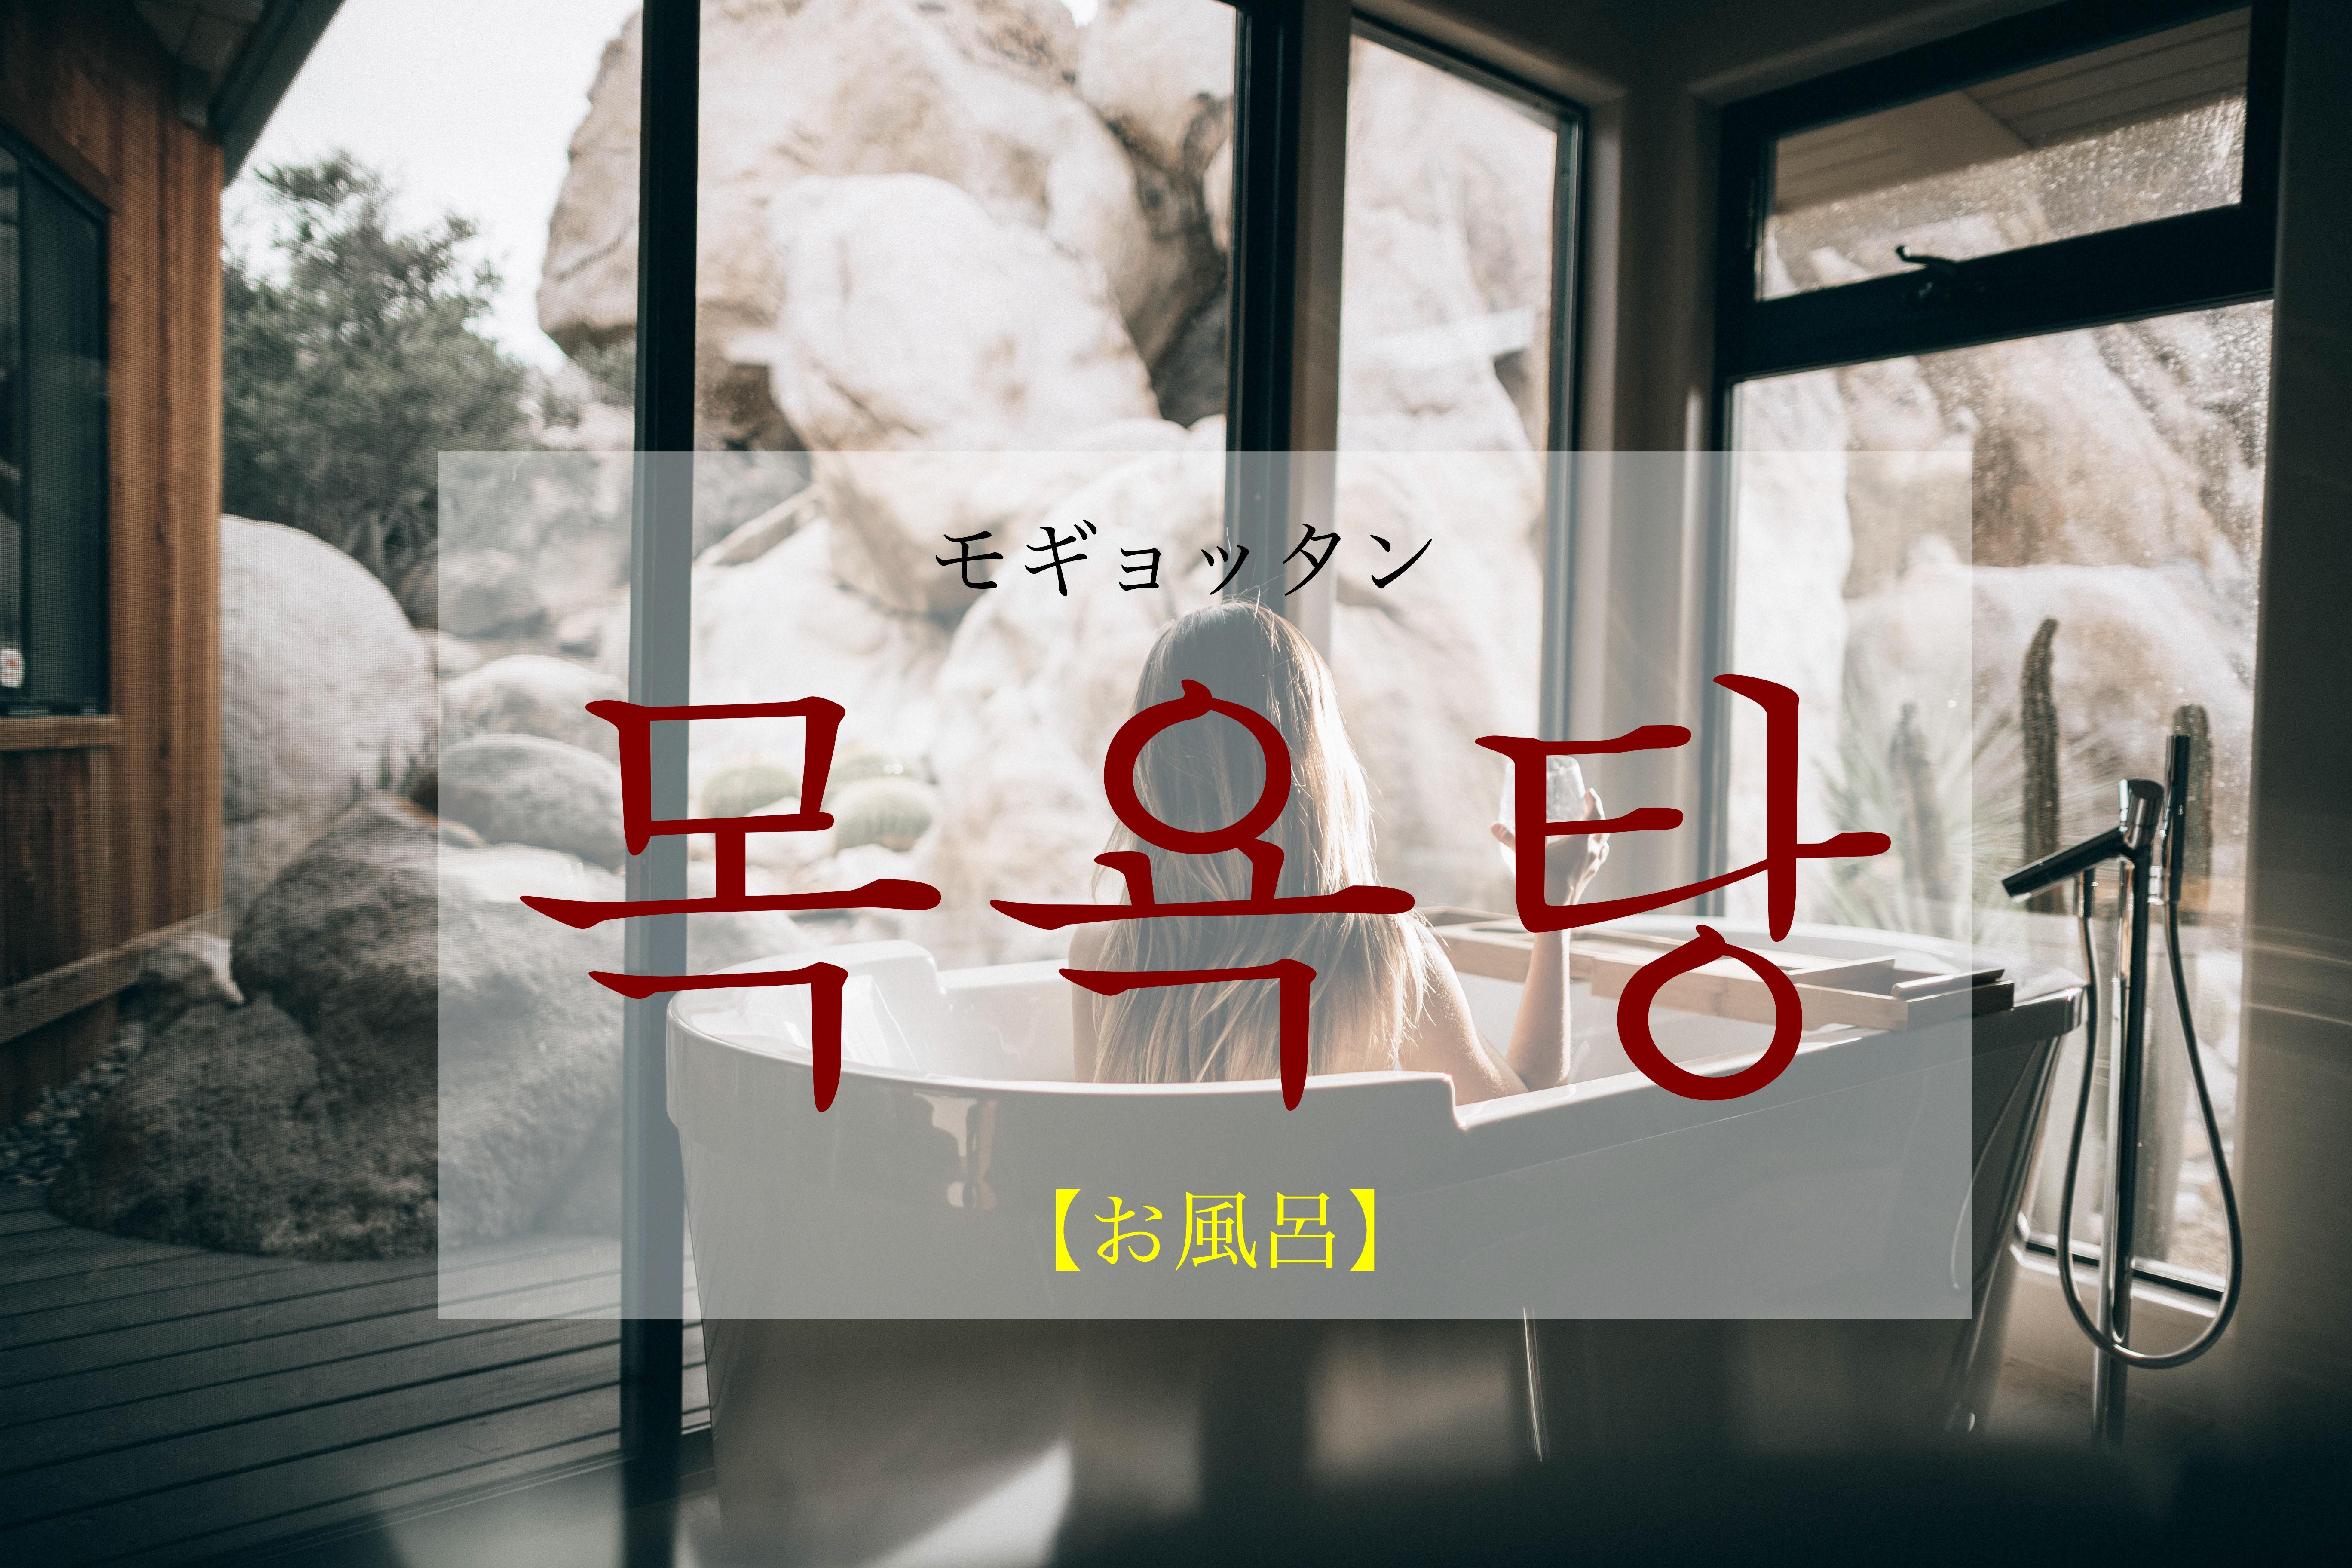 koreanword-bath